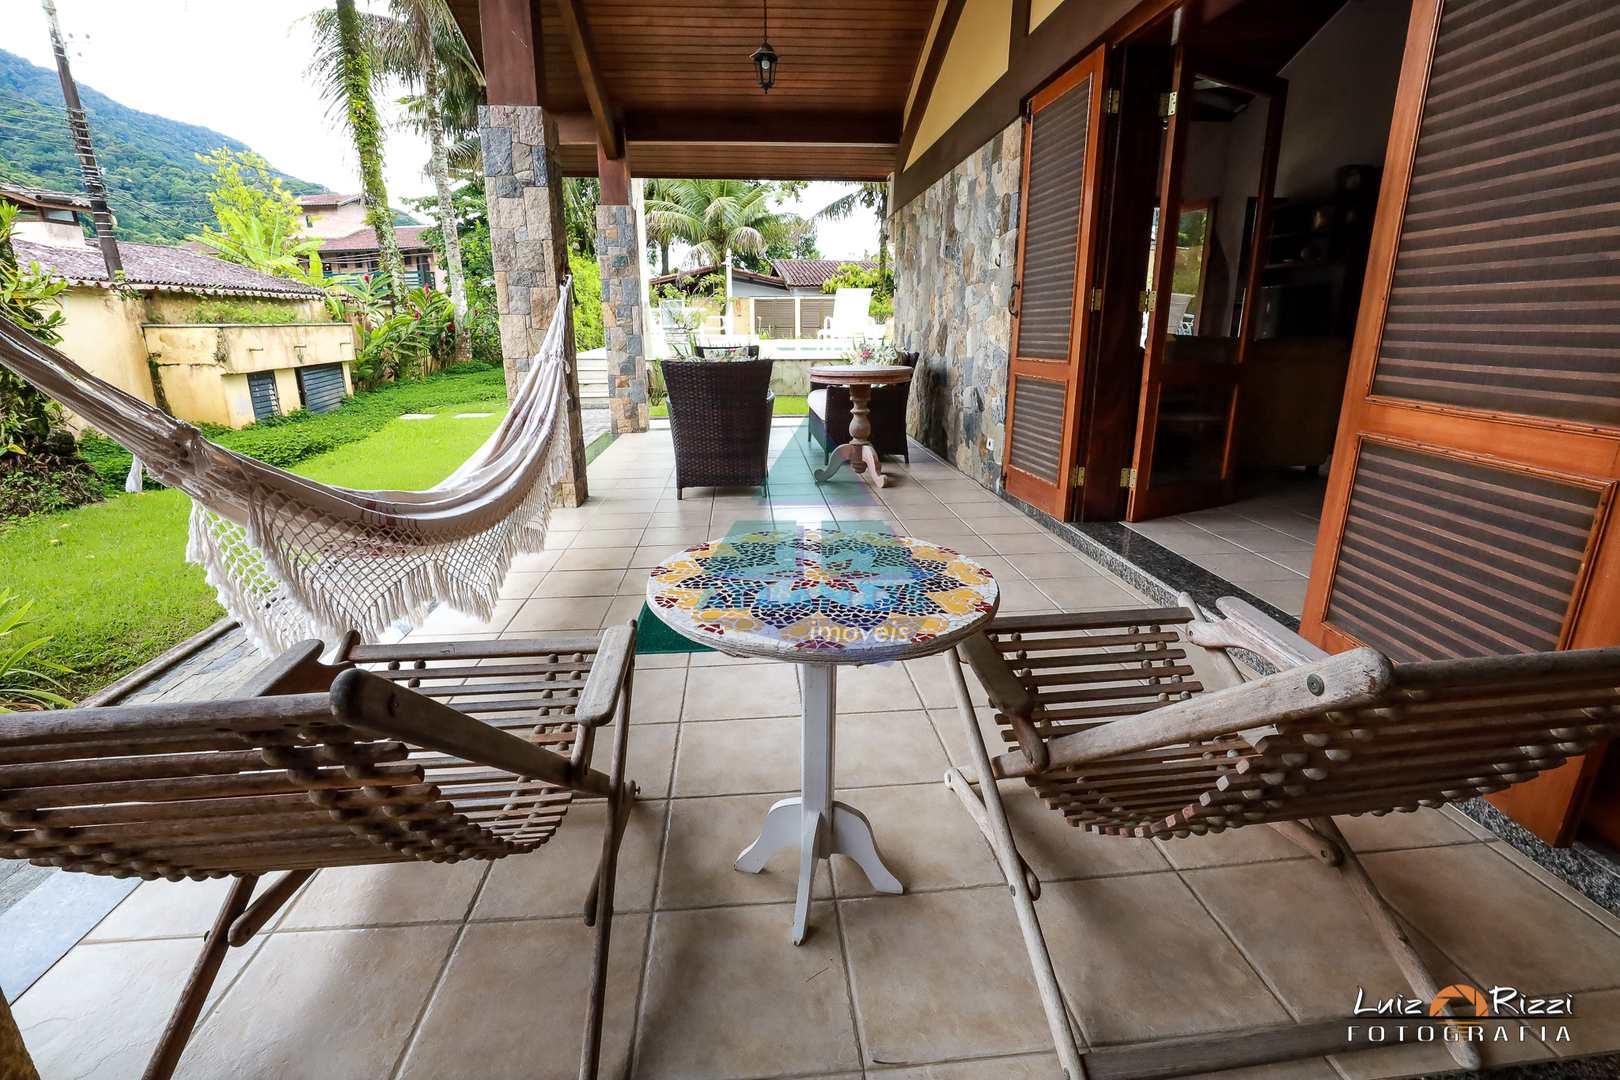 Casa com 7 dorms, Praia do Lázaro, Ubatuba - R$ 2.2 mi, Cod: 1352